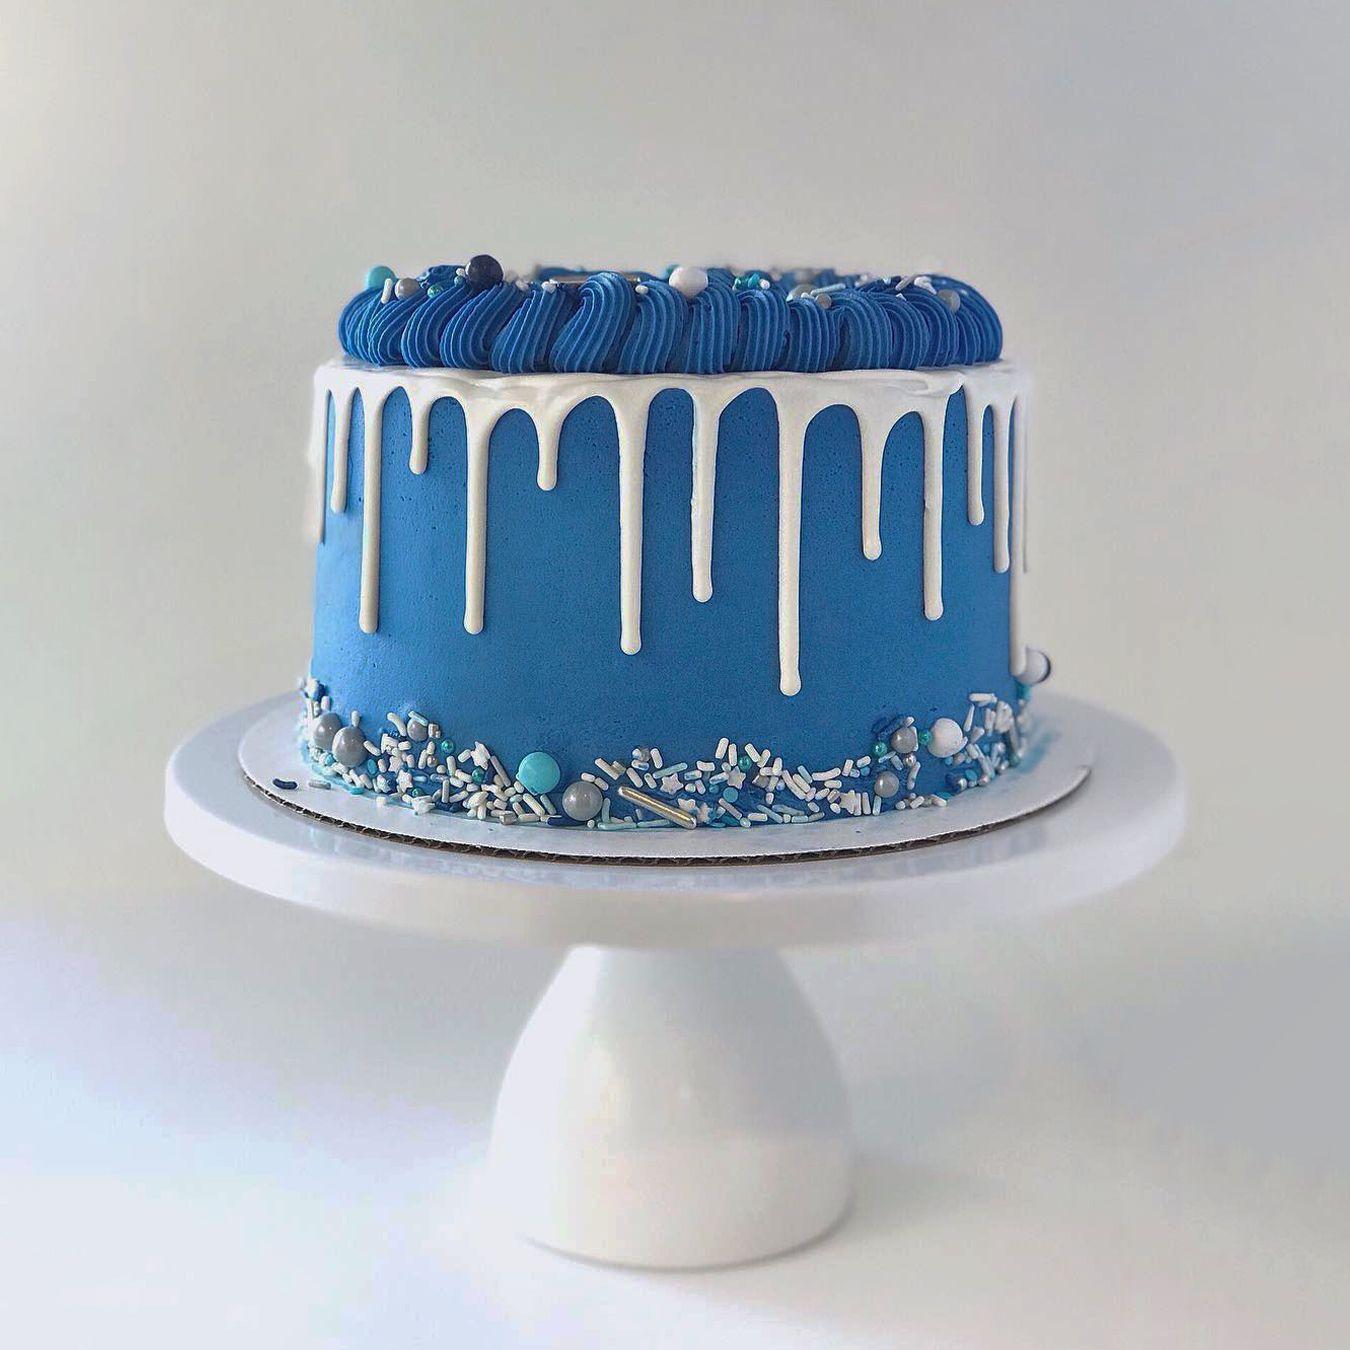 Winter Wonderland Drip Cake with Blue Buttercream | Blue birthday cakes,  Drip cakes, Cake